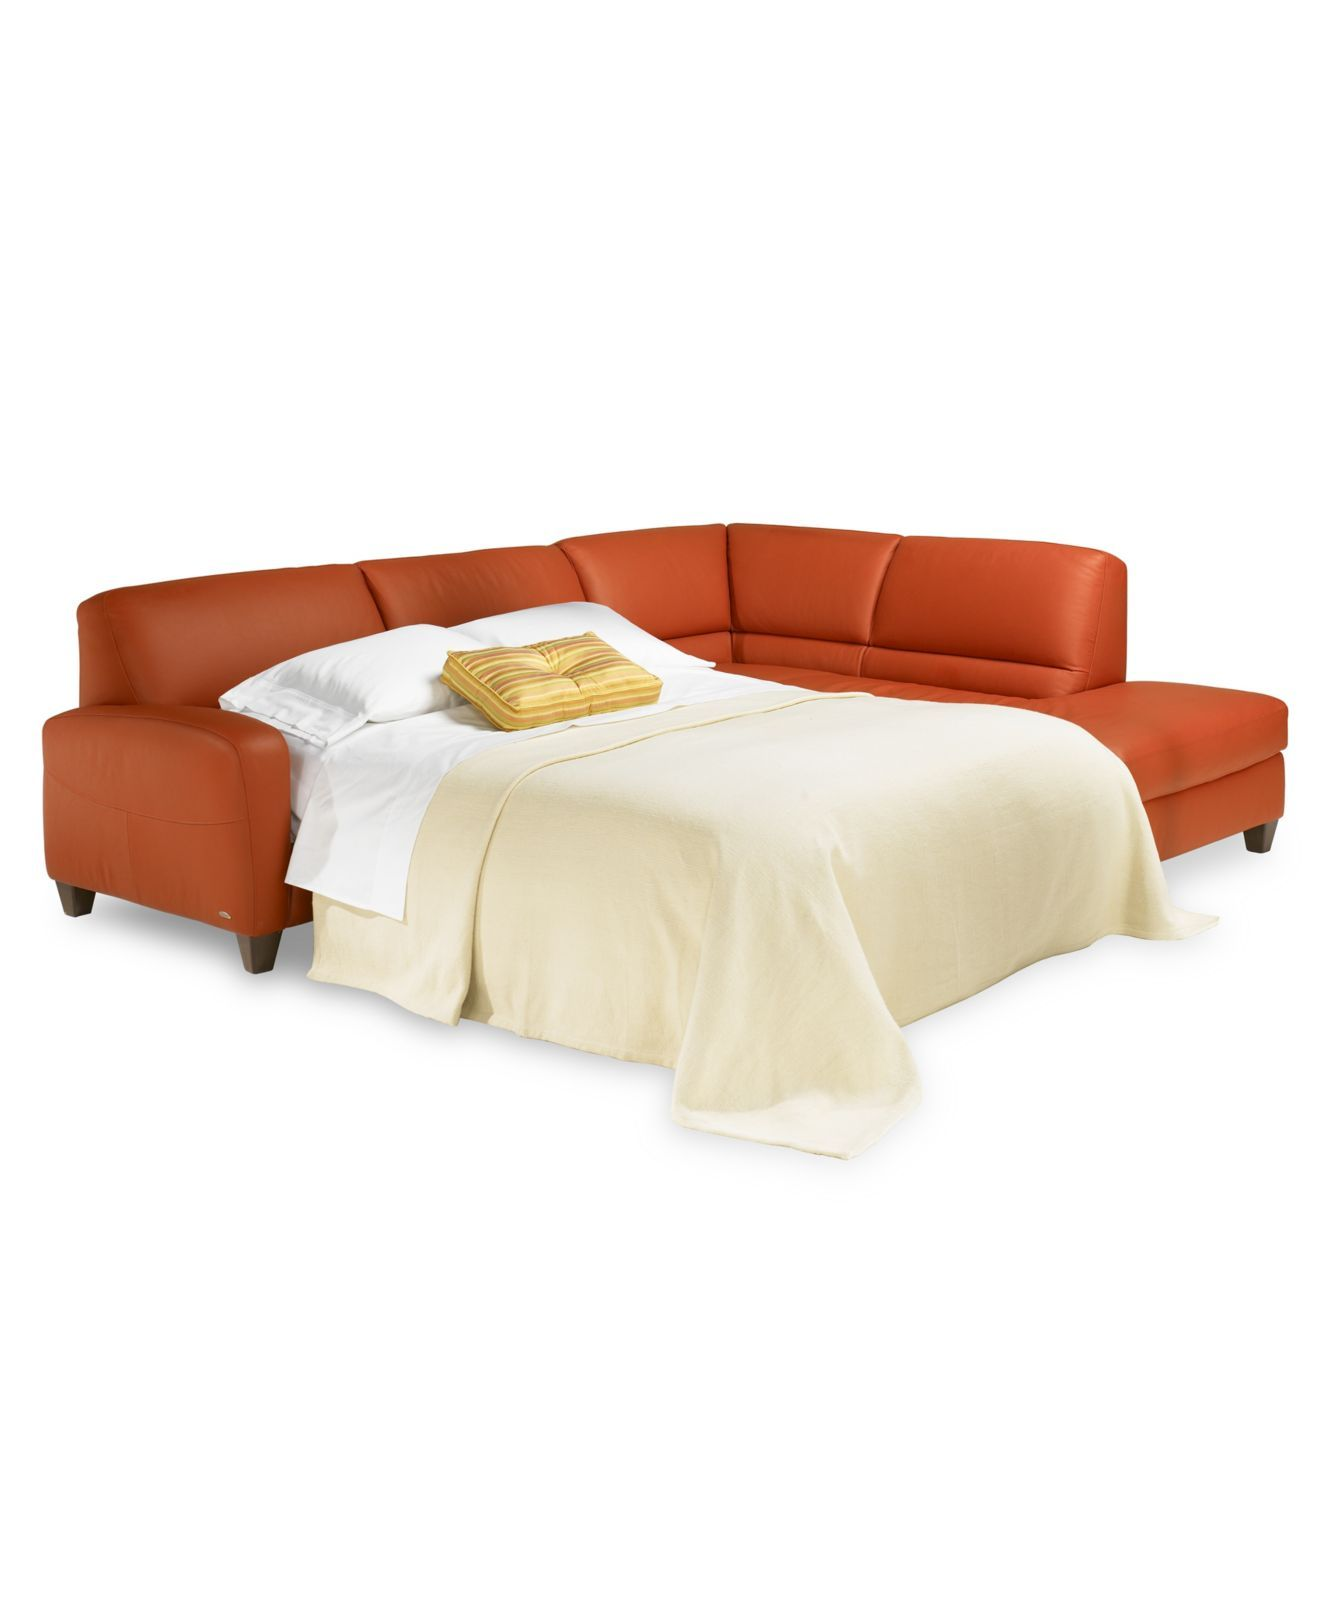 Renata Sectional Sofa 2 Piece Leather Sleeper Custom Colors